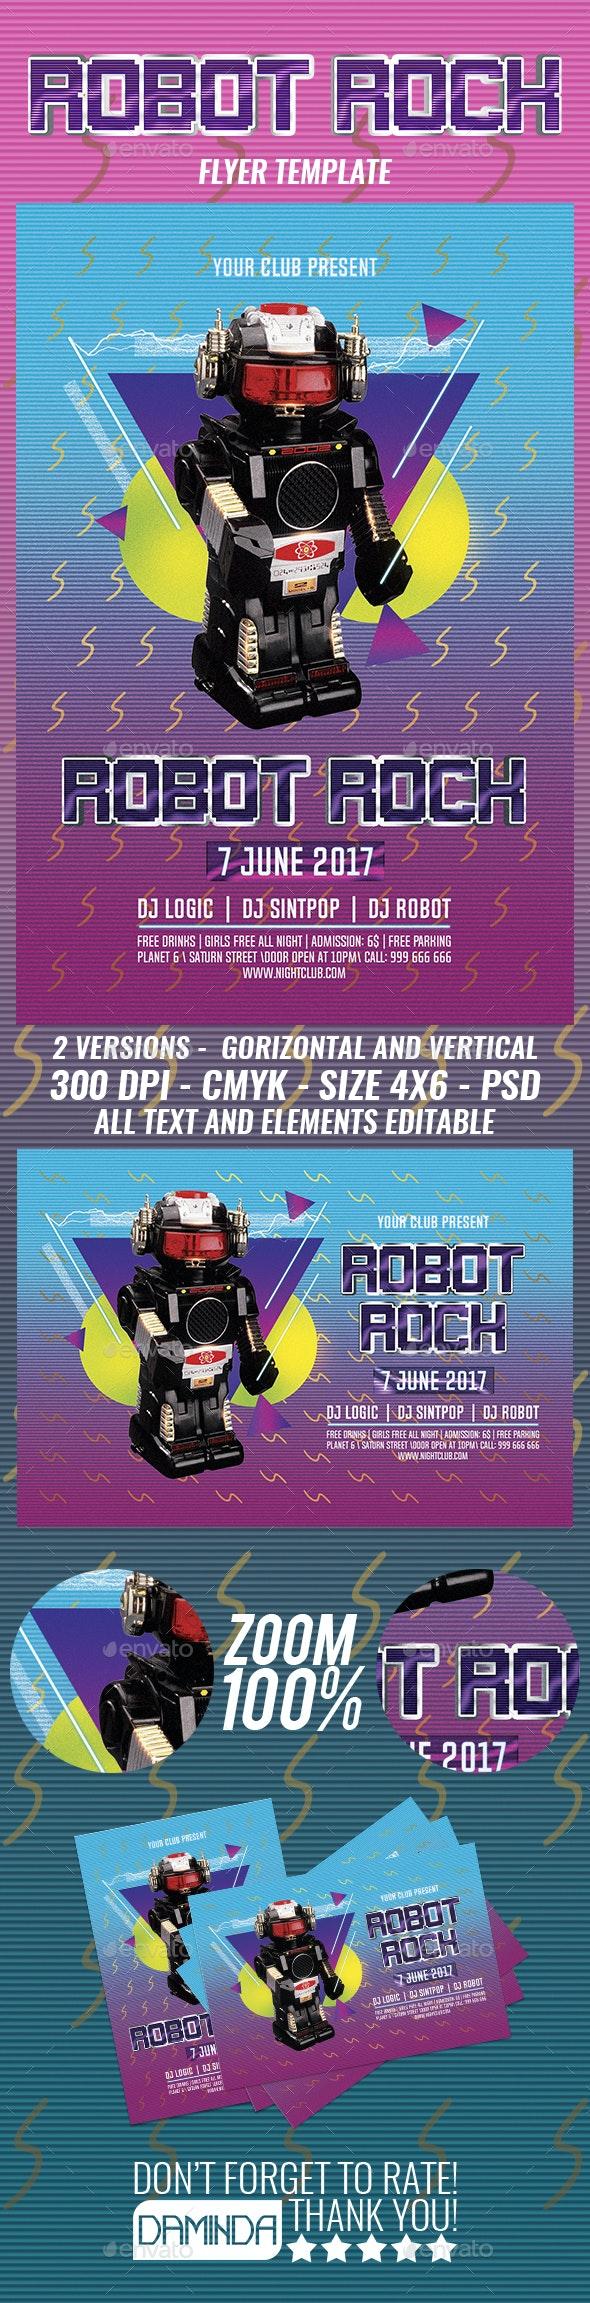 Robot Rock 2 Flyer Template - Clubs & Parties Events